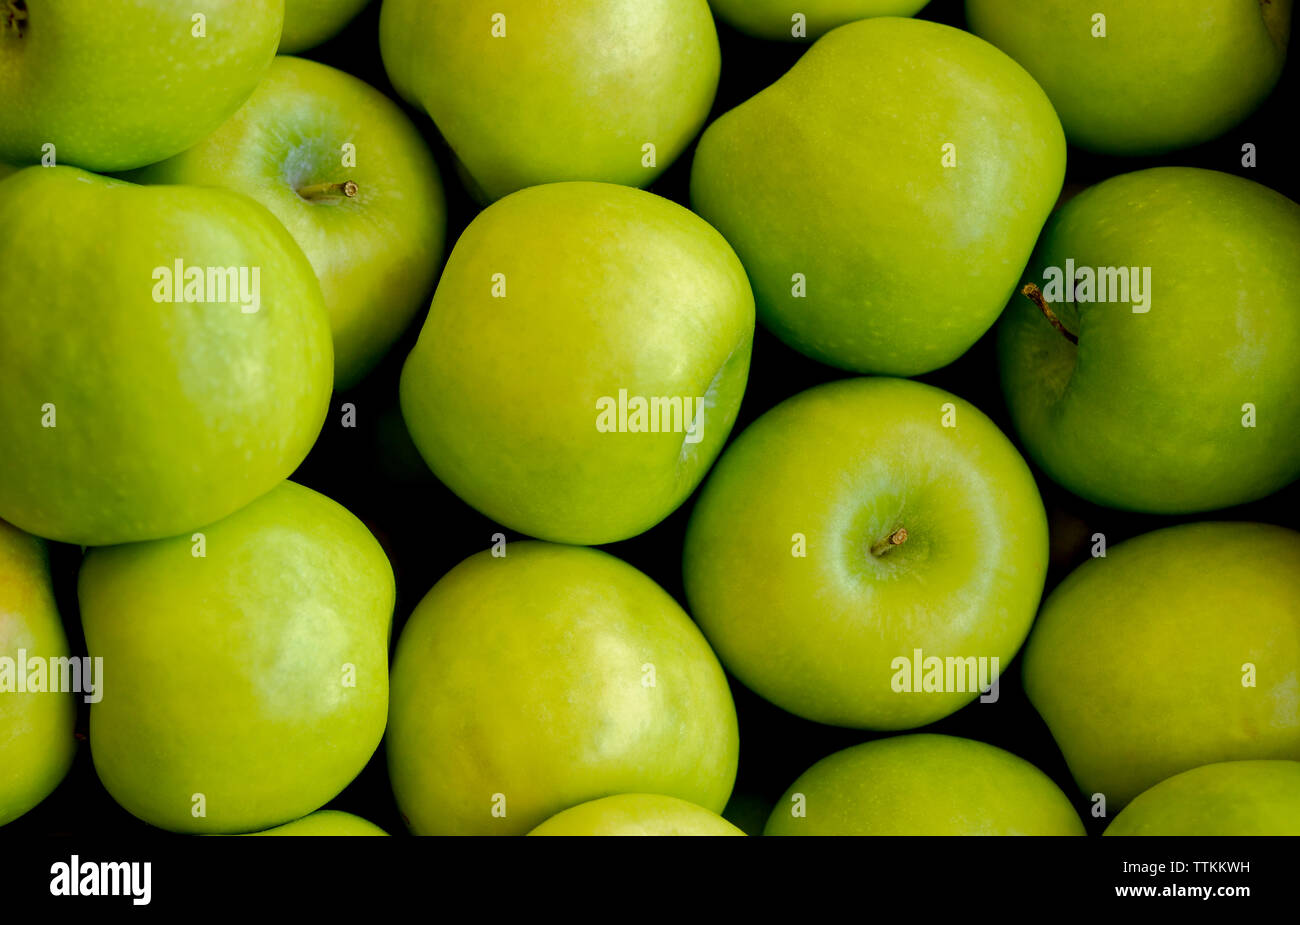 Granny Smith green apples - Stock Image